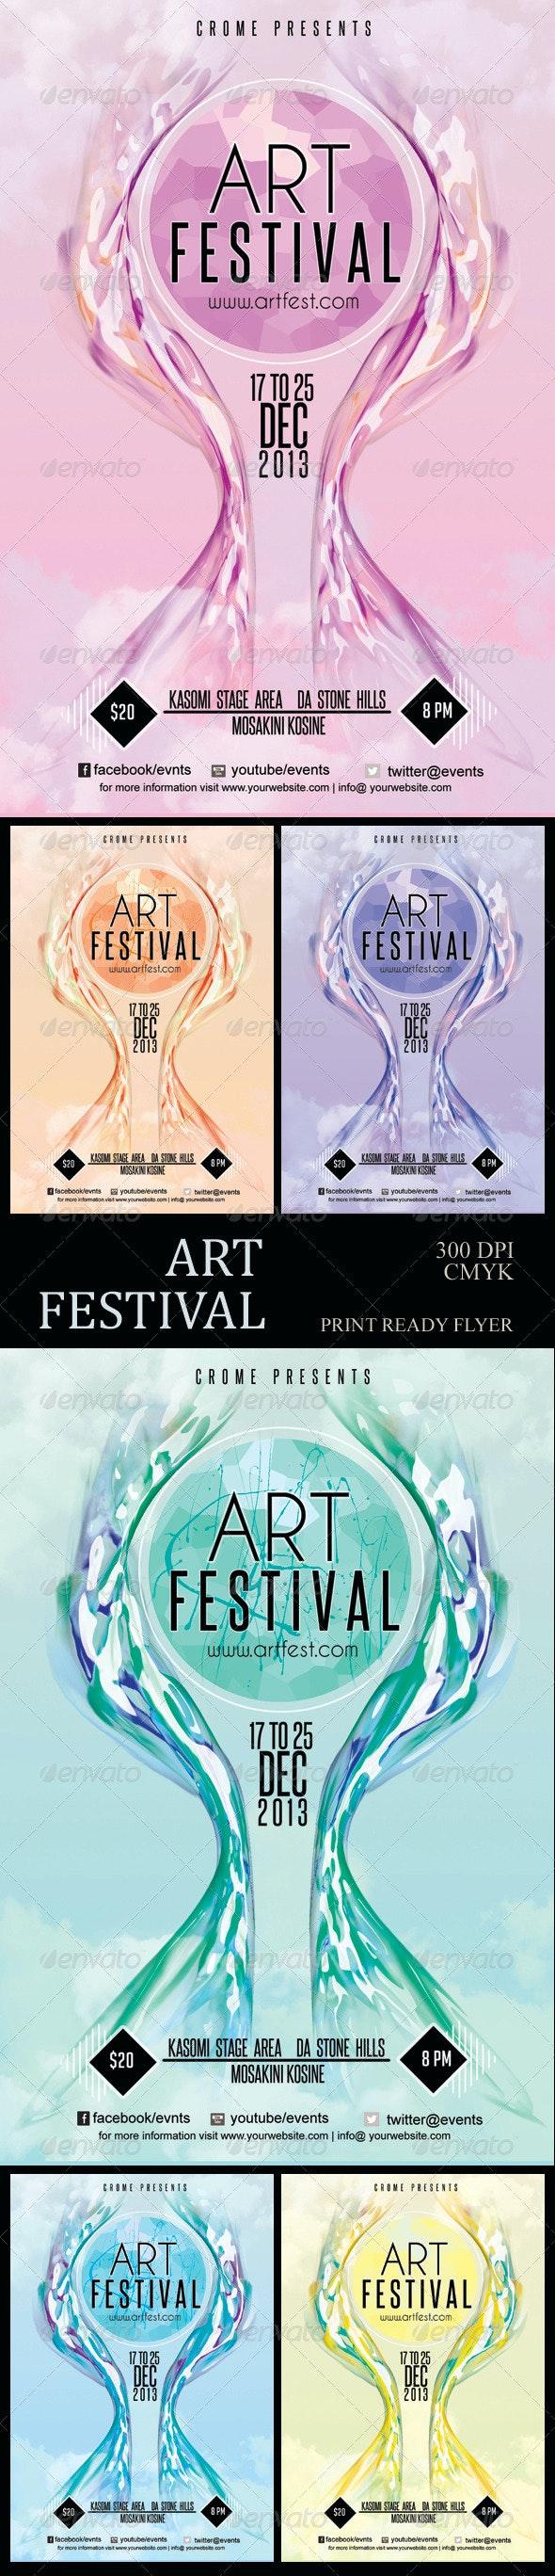 Art Festival Flyer - Miscellaneous Events